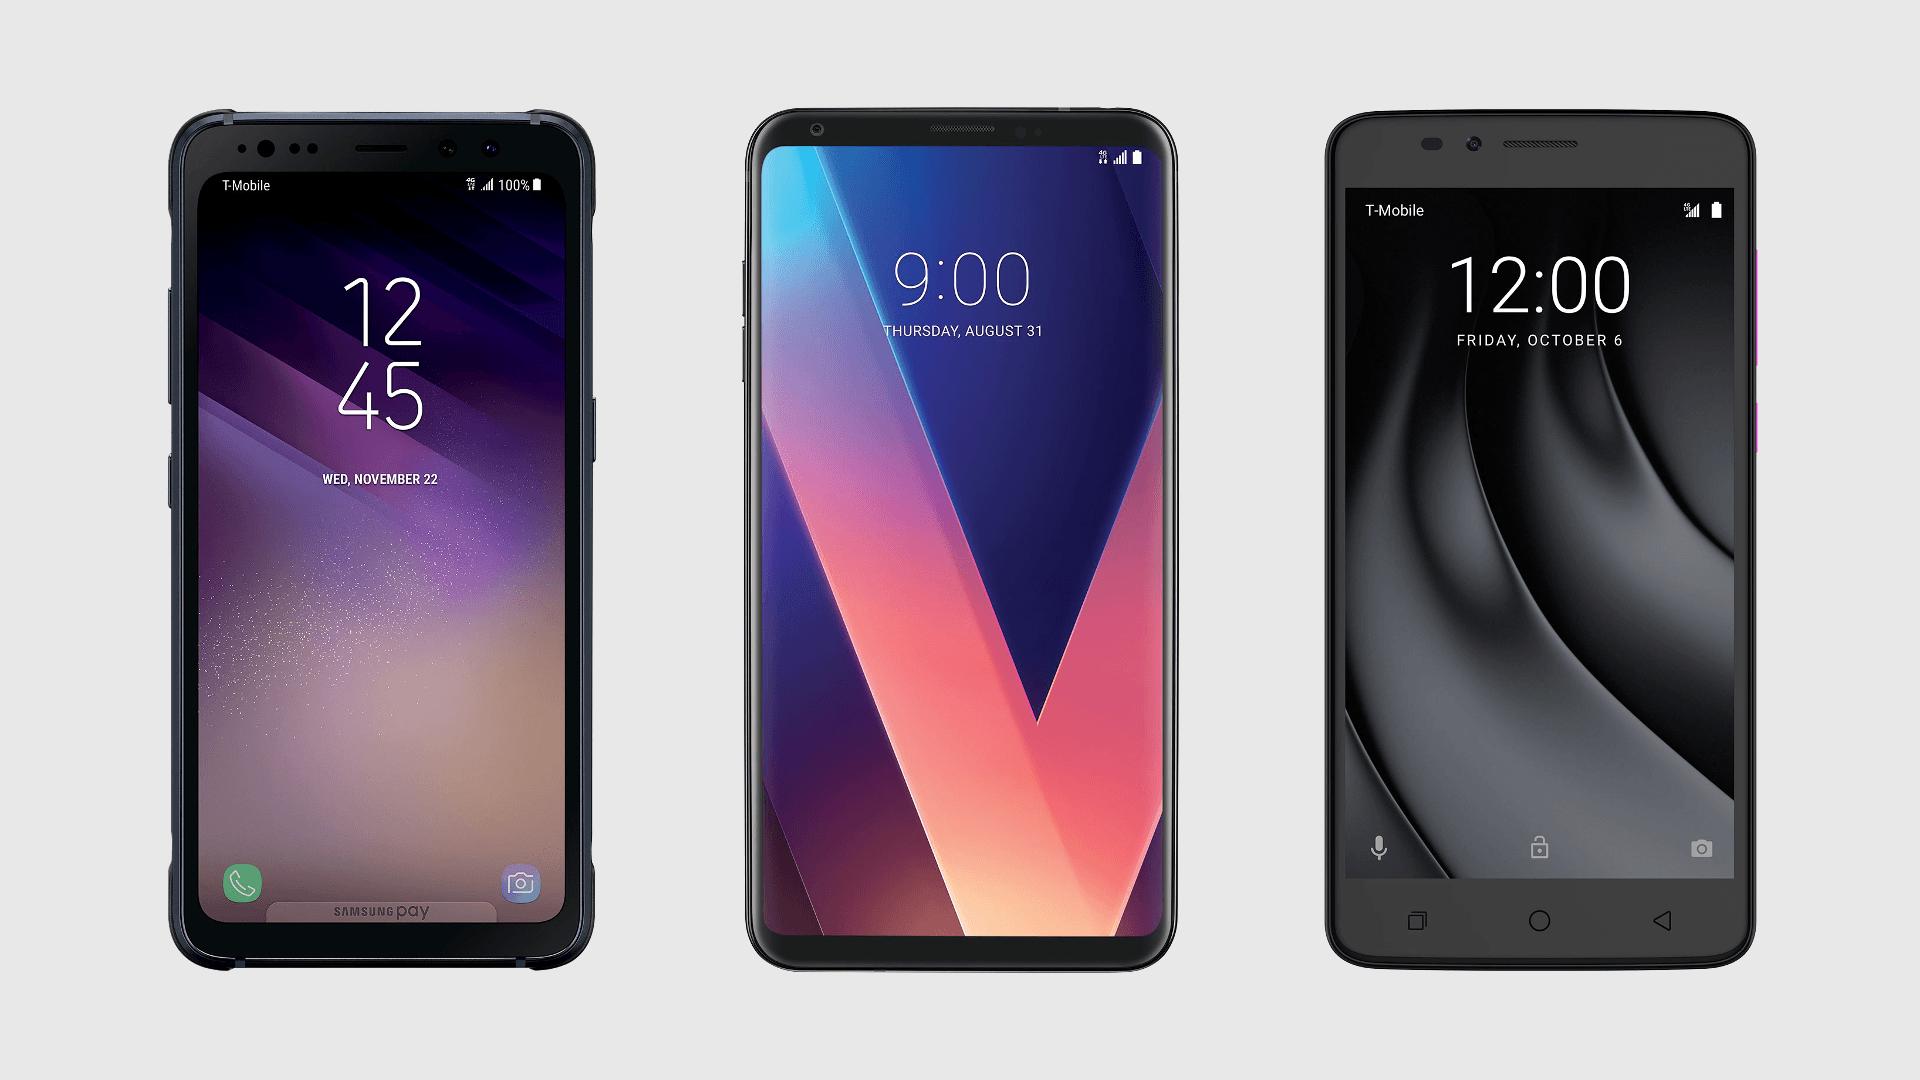 T-Mobile Samsung Galaxy S8 Active, LG V30+, Revvl Plus